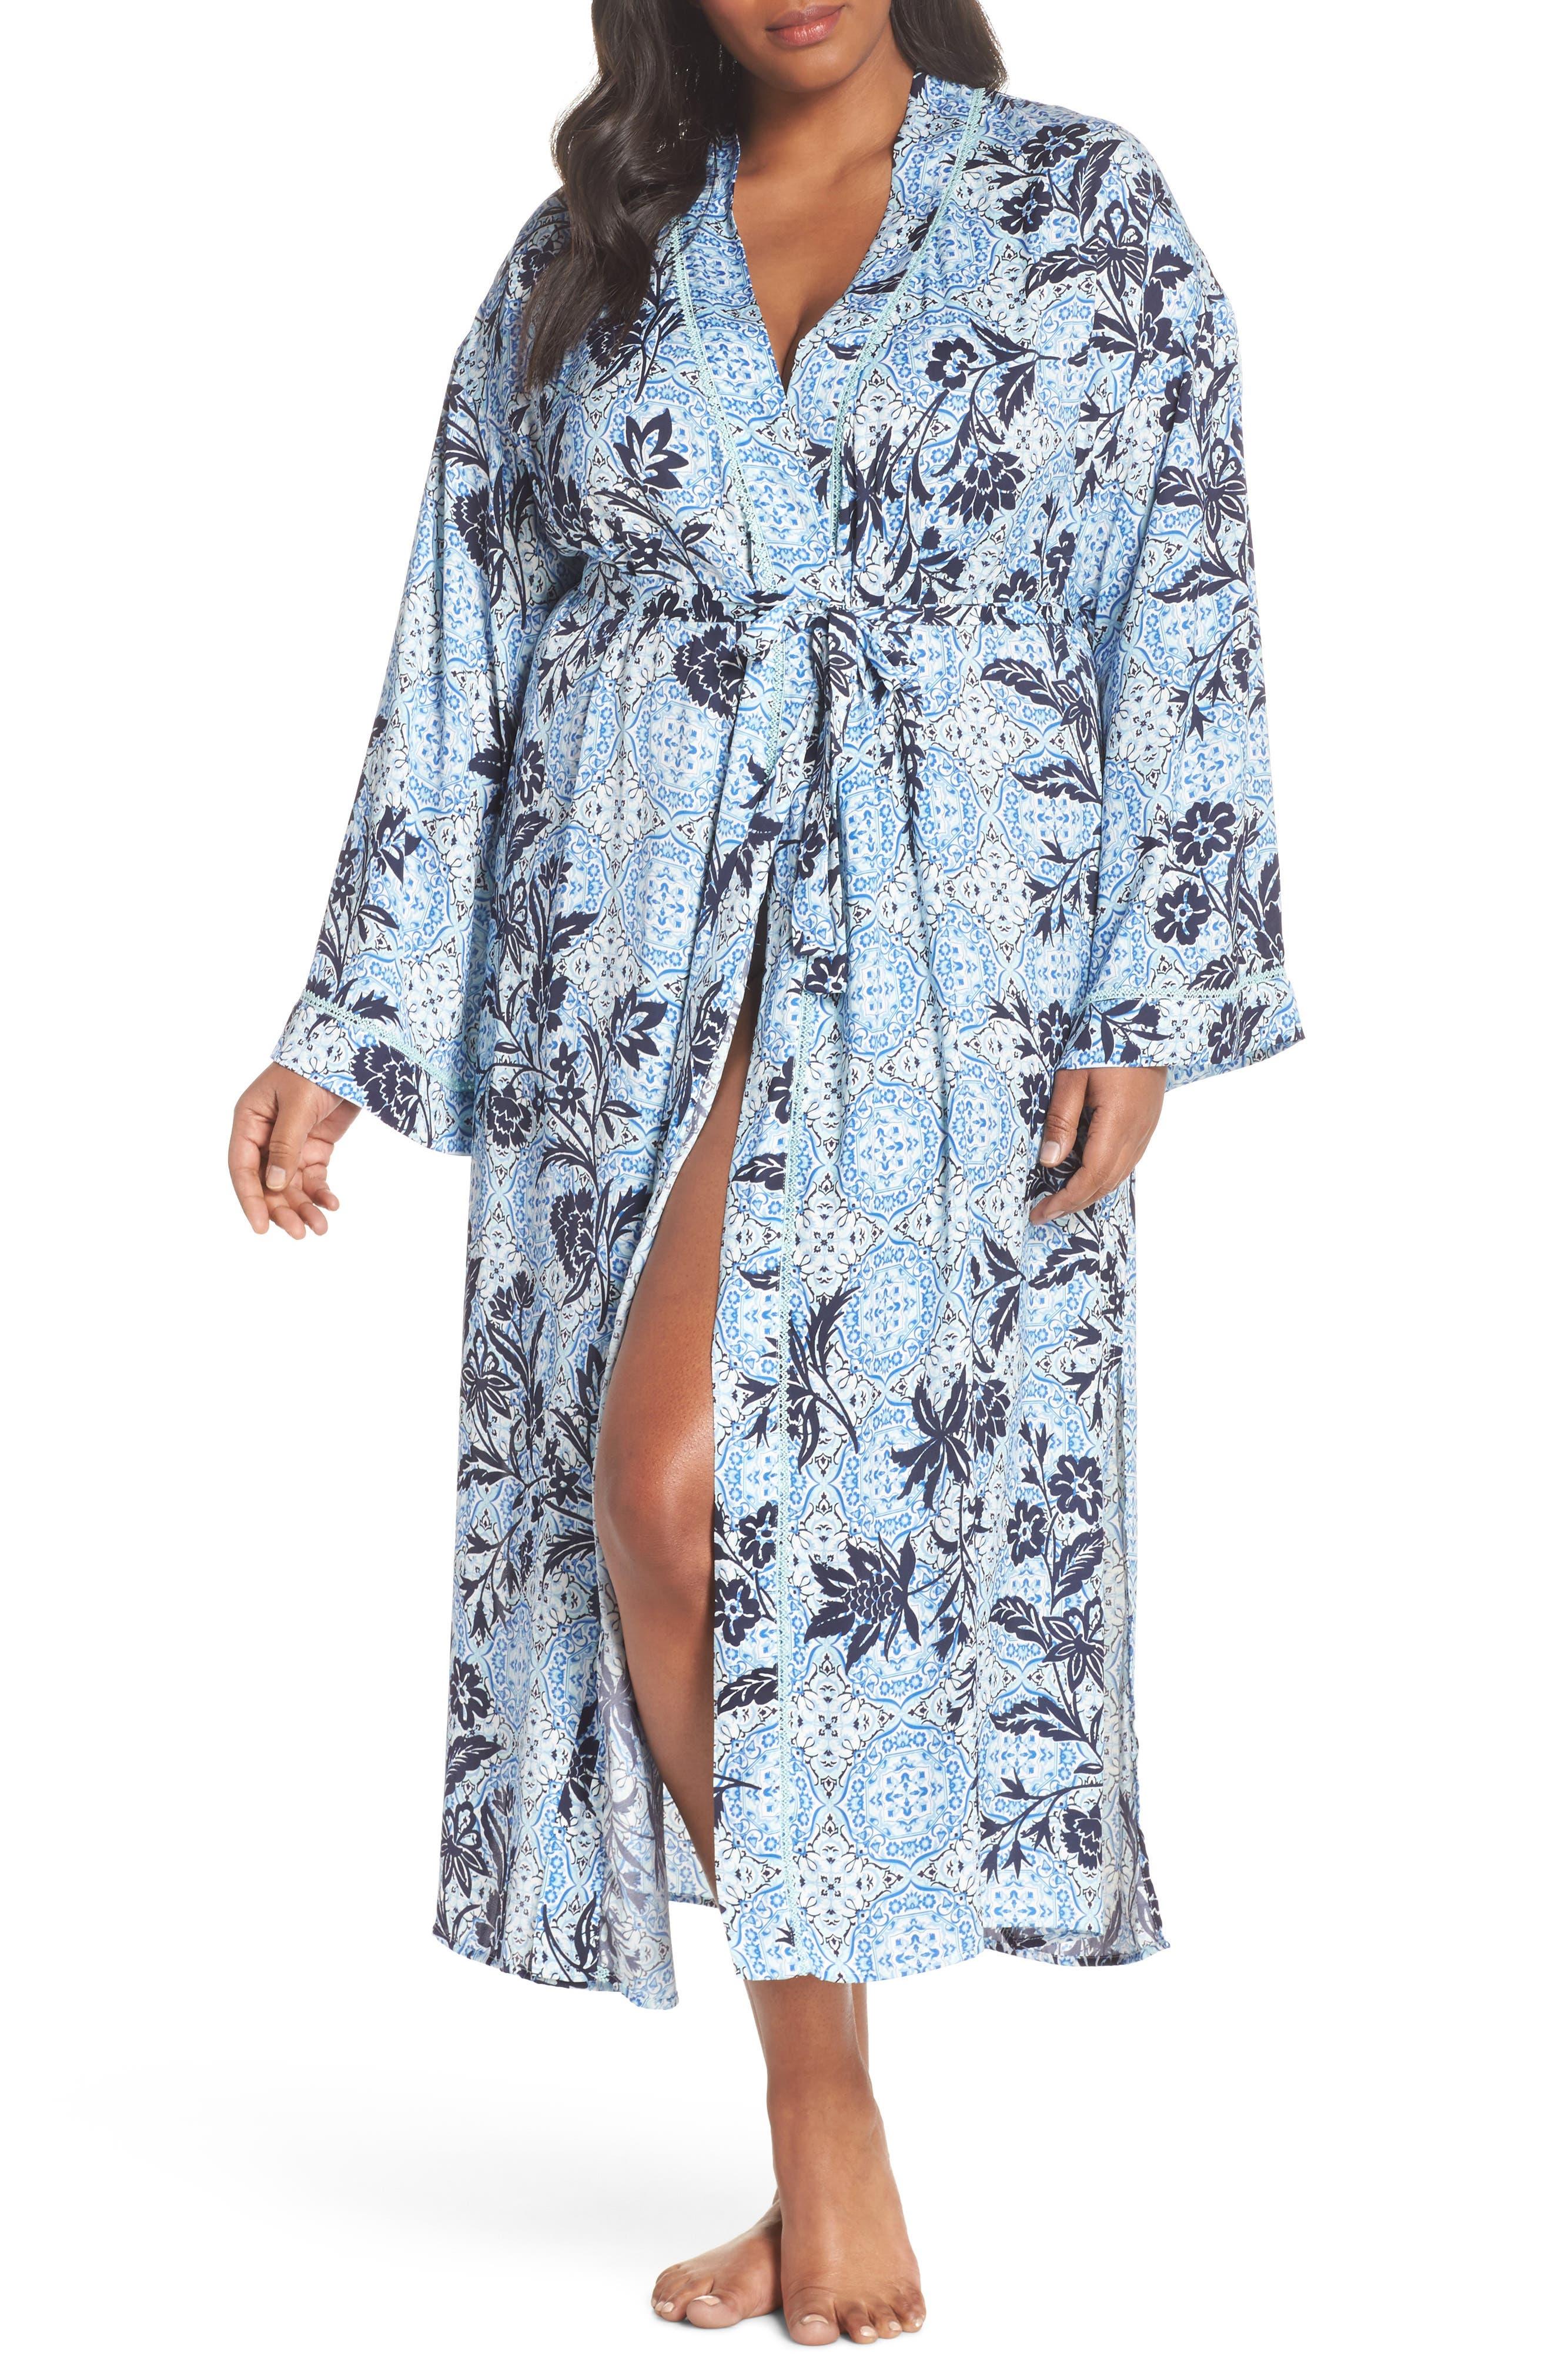 Alternate Image 1 Selected - Nordstrom Lingerie Sweet Dreams Satin Robe (Plus Size)